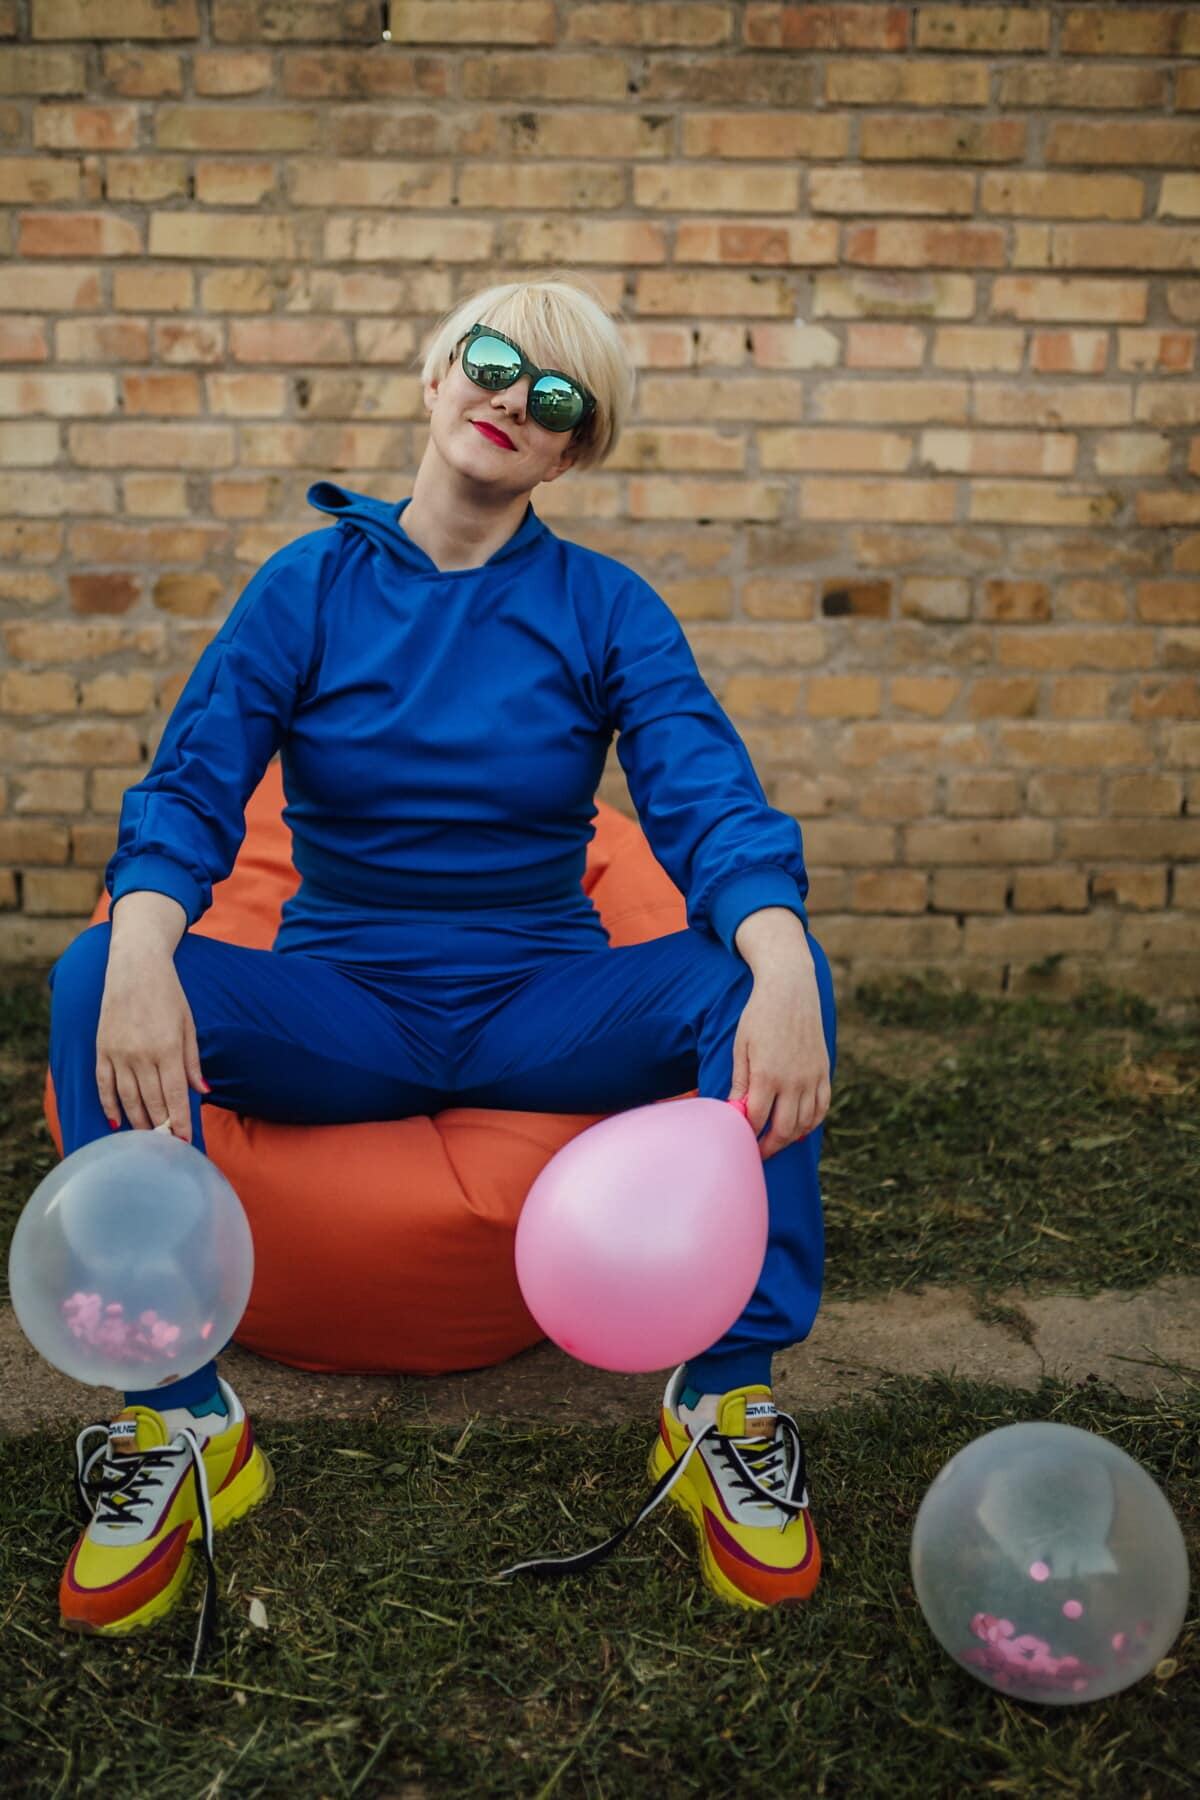 Blau, Outfit, Sport, blonde Haare, Entspannung, sitzen, junge Frau, Mädchen, Porträt, Ballon